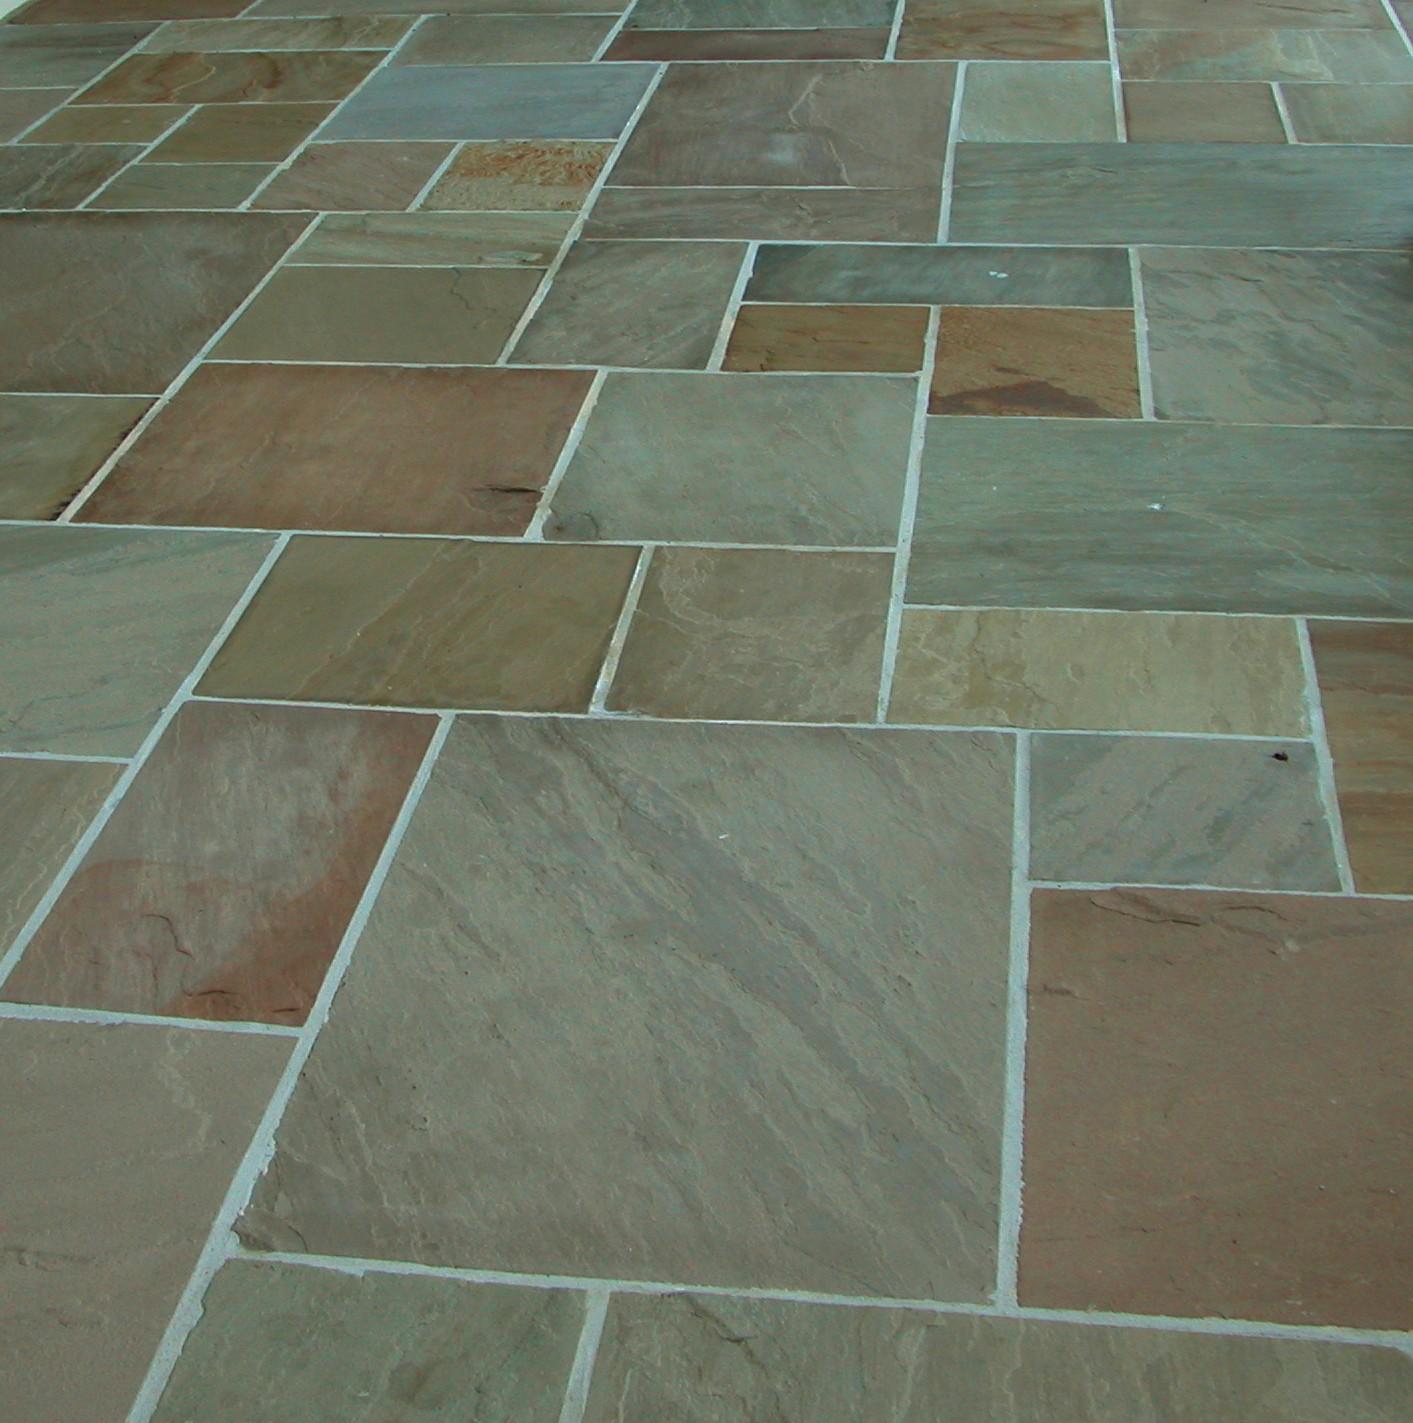 600 Msp 19 50 M2 Raj Green 22 Mm Calibrated Sandstone